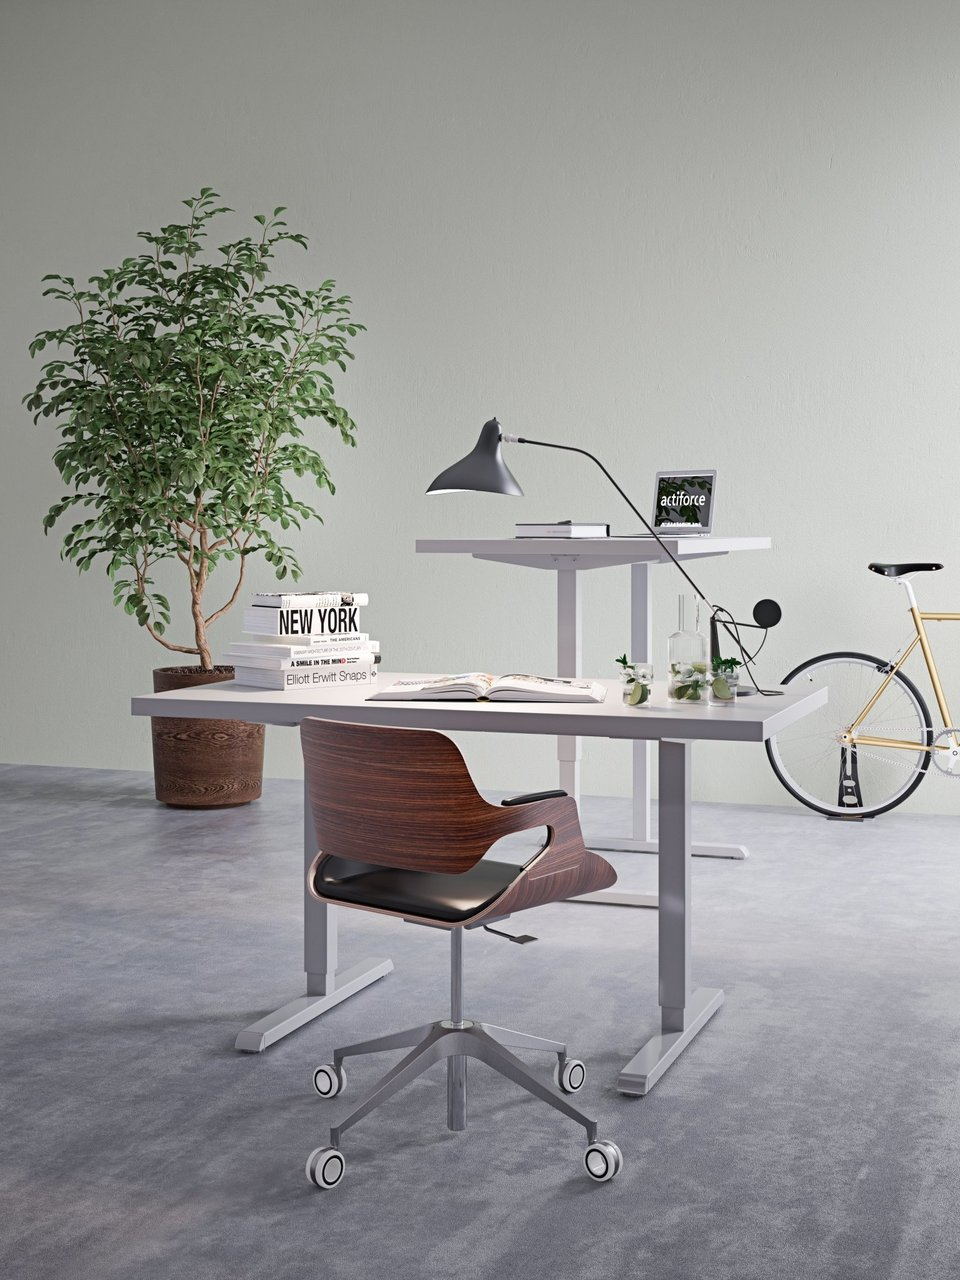 SteelForce 300 zit-sta bureau verstelbaar bureau